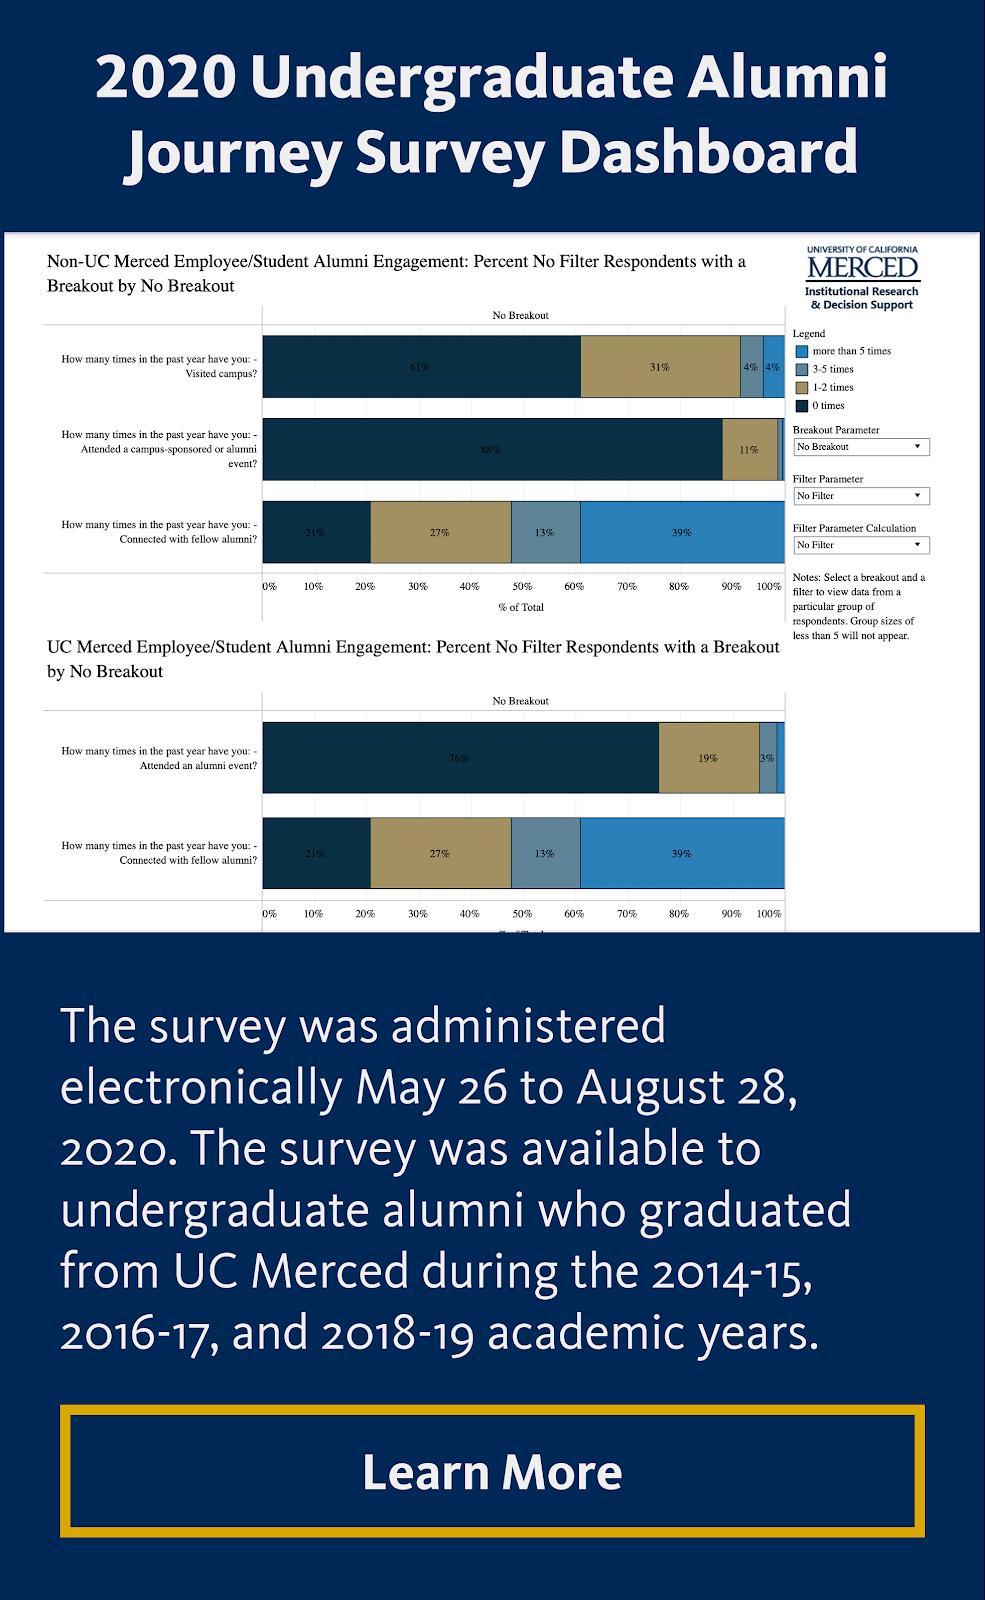 2020 Undergraduate Alumni Journey Survey Dashboard